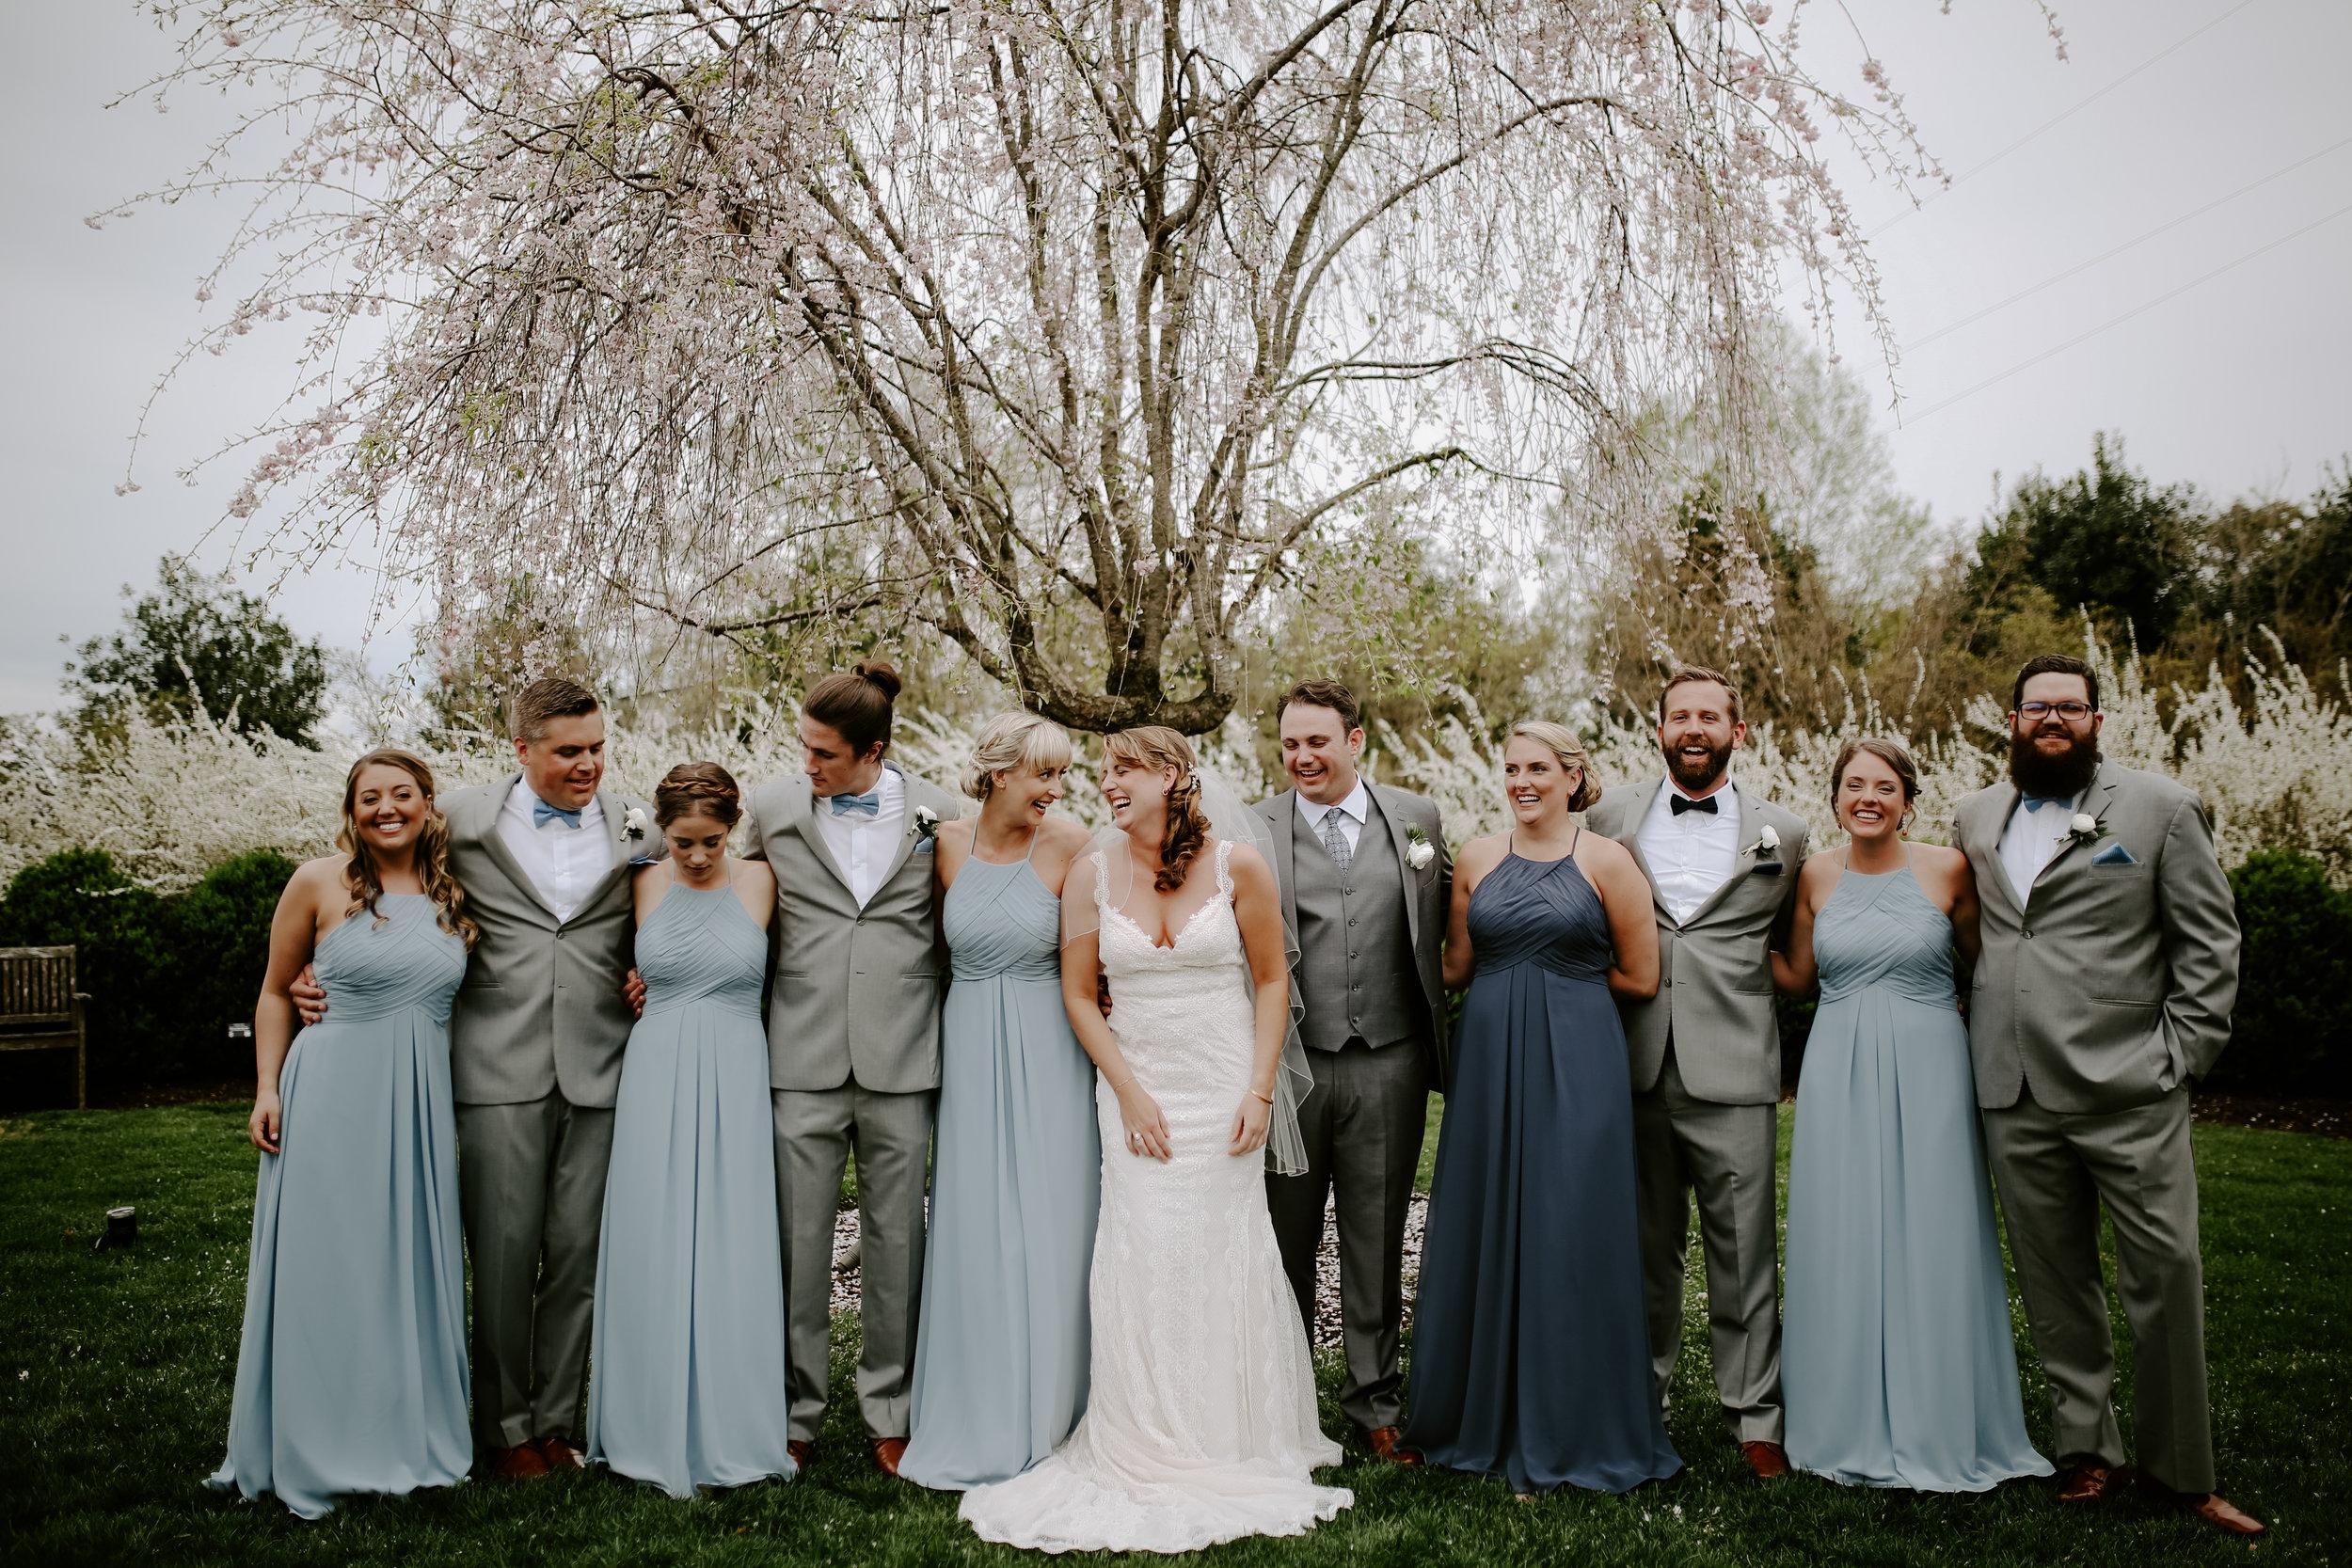 TheGreens_Married_2019-132.jpg